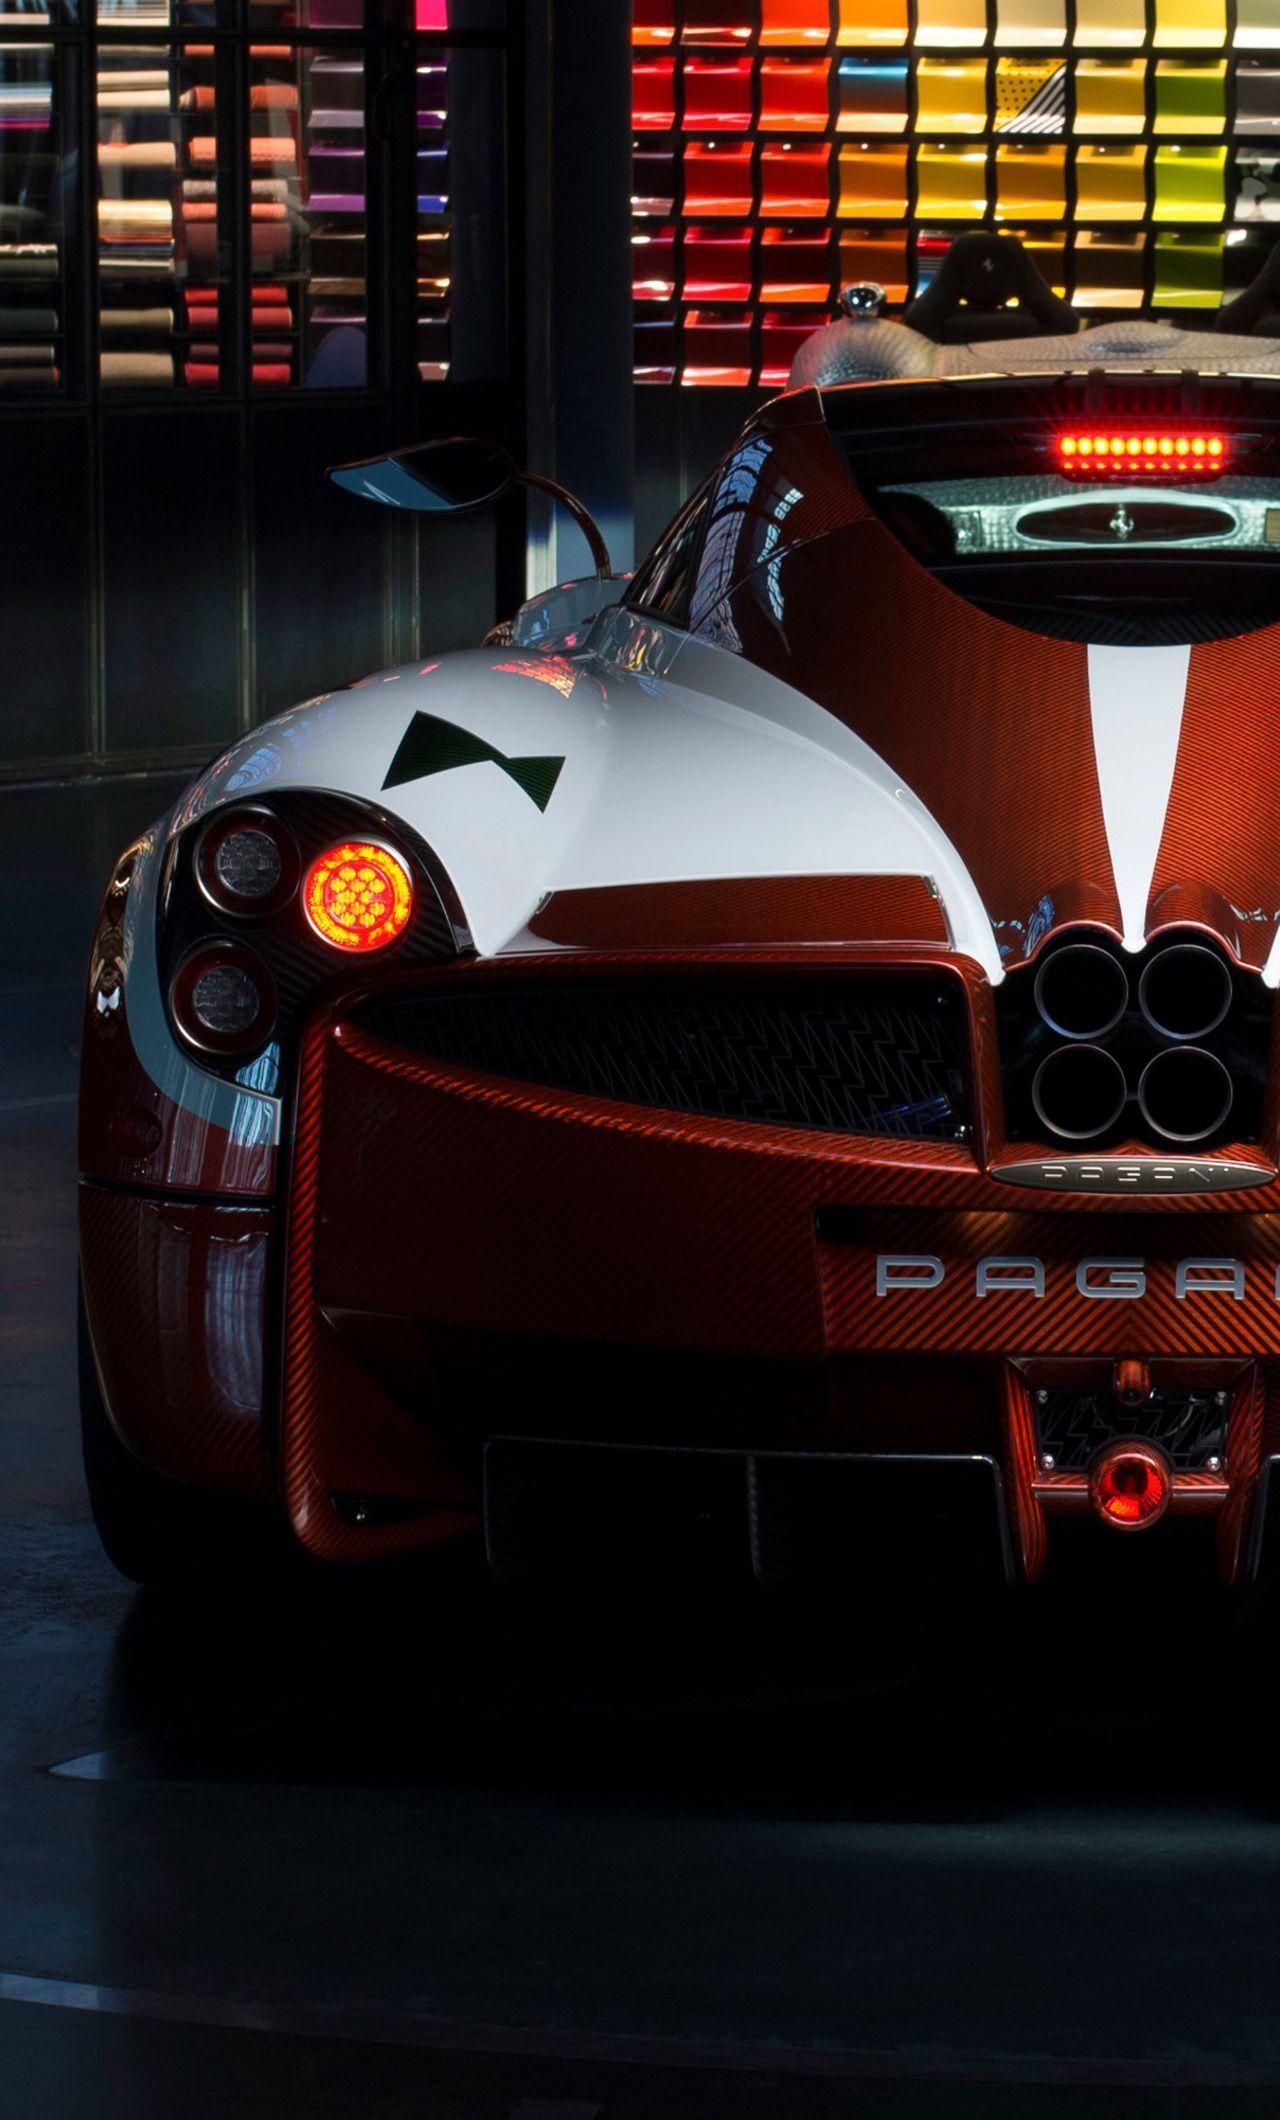 Best Cars There Are Pagani Huayra Vehicles Lamborghini Hennessey Venom Koenigsegg Agera Rs Bugatti Veyr Super Cars Porsche Iphone Wallpaper All Audi Cars